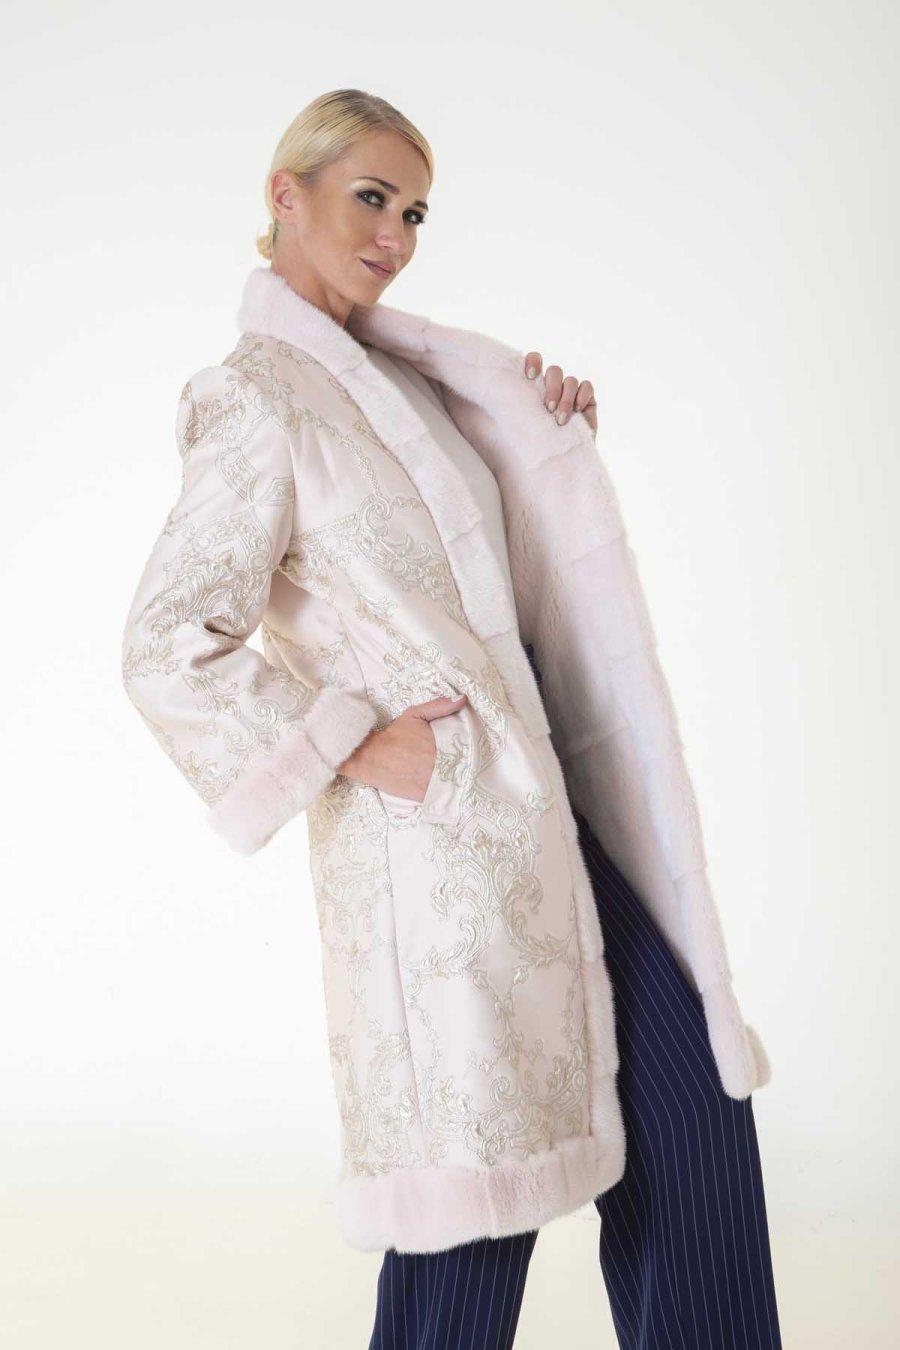 Rosa Scuro Male Mink and Fabric Jacket | Sarigianni Furs